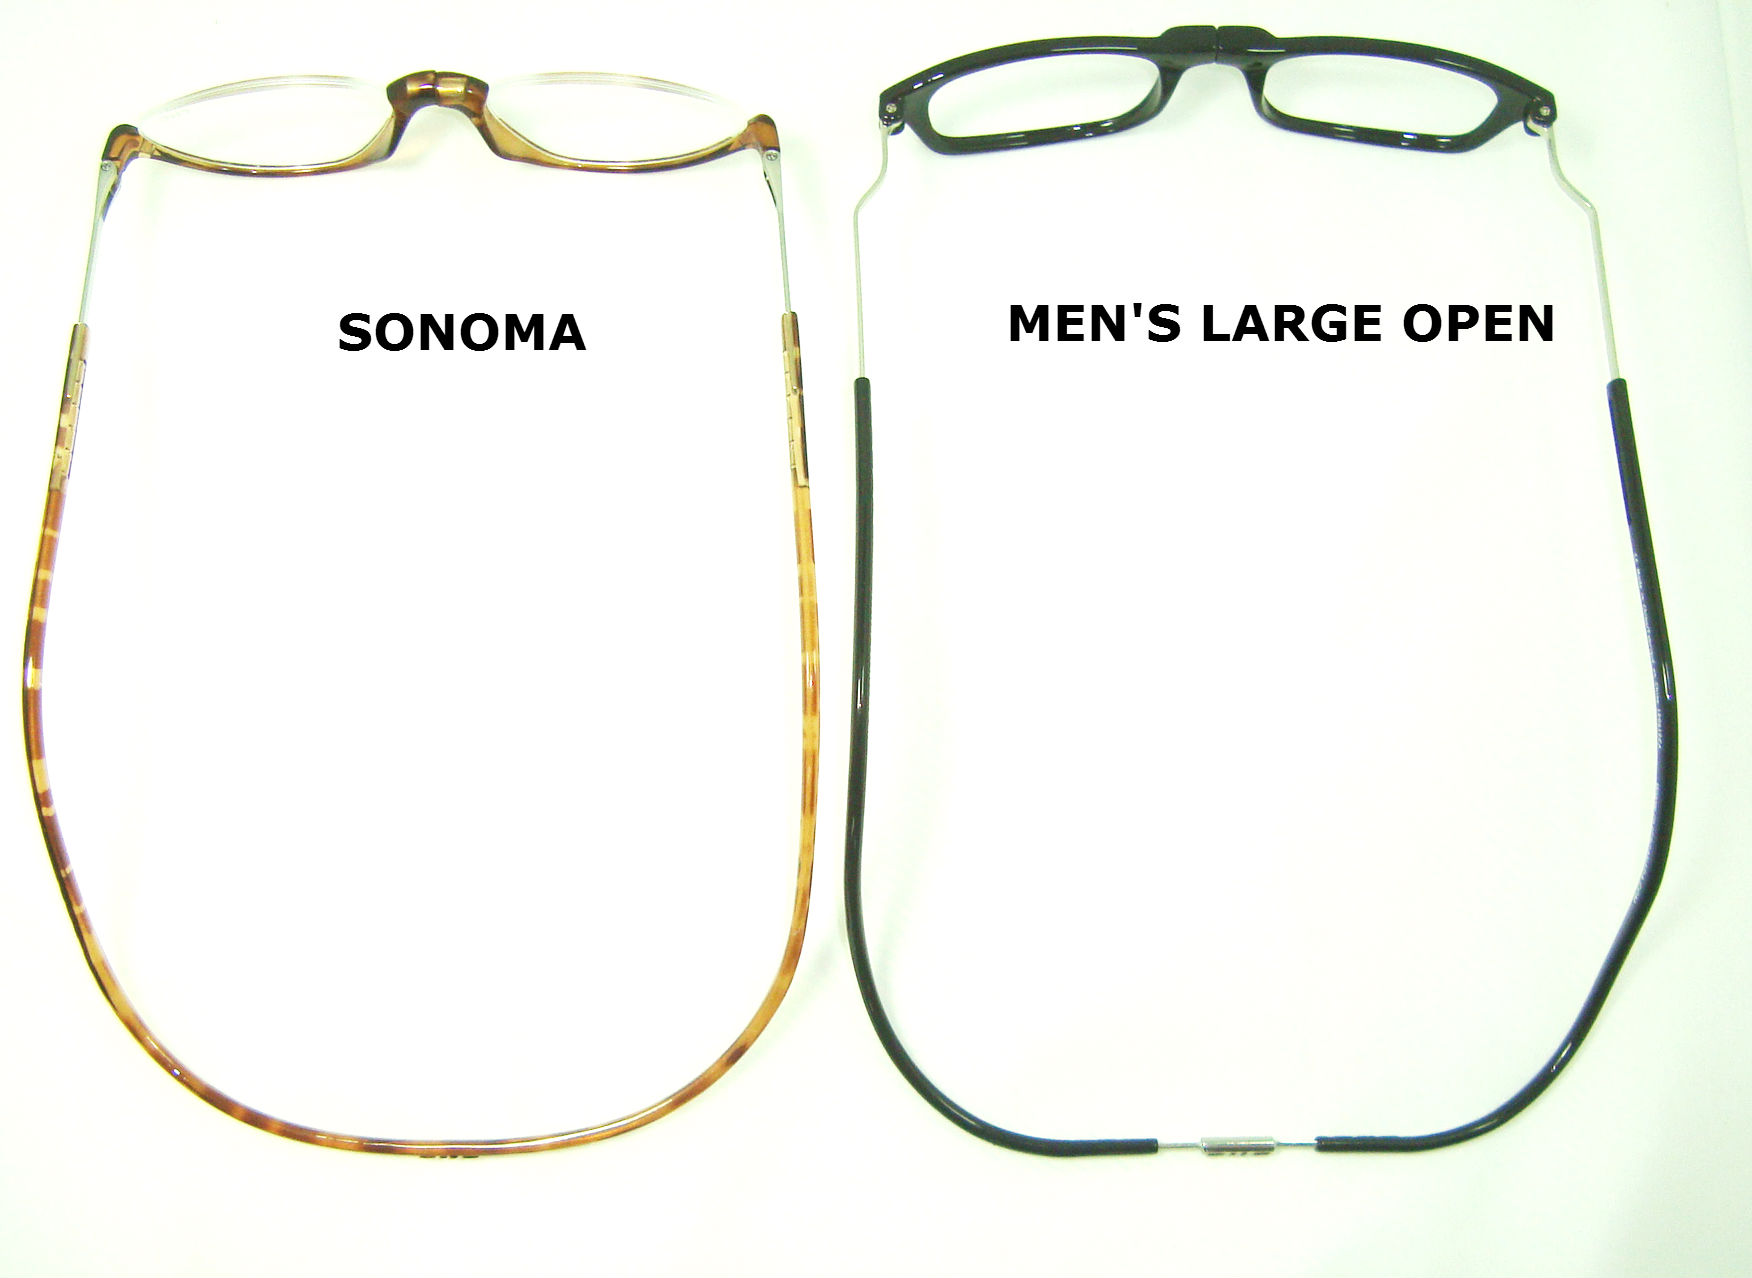 SONOMA&MEN'S LARGE WEB